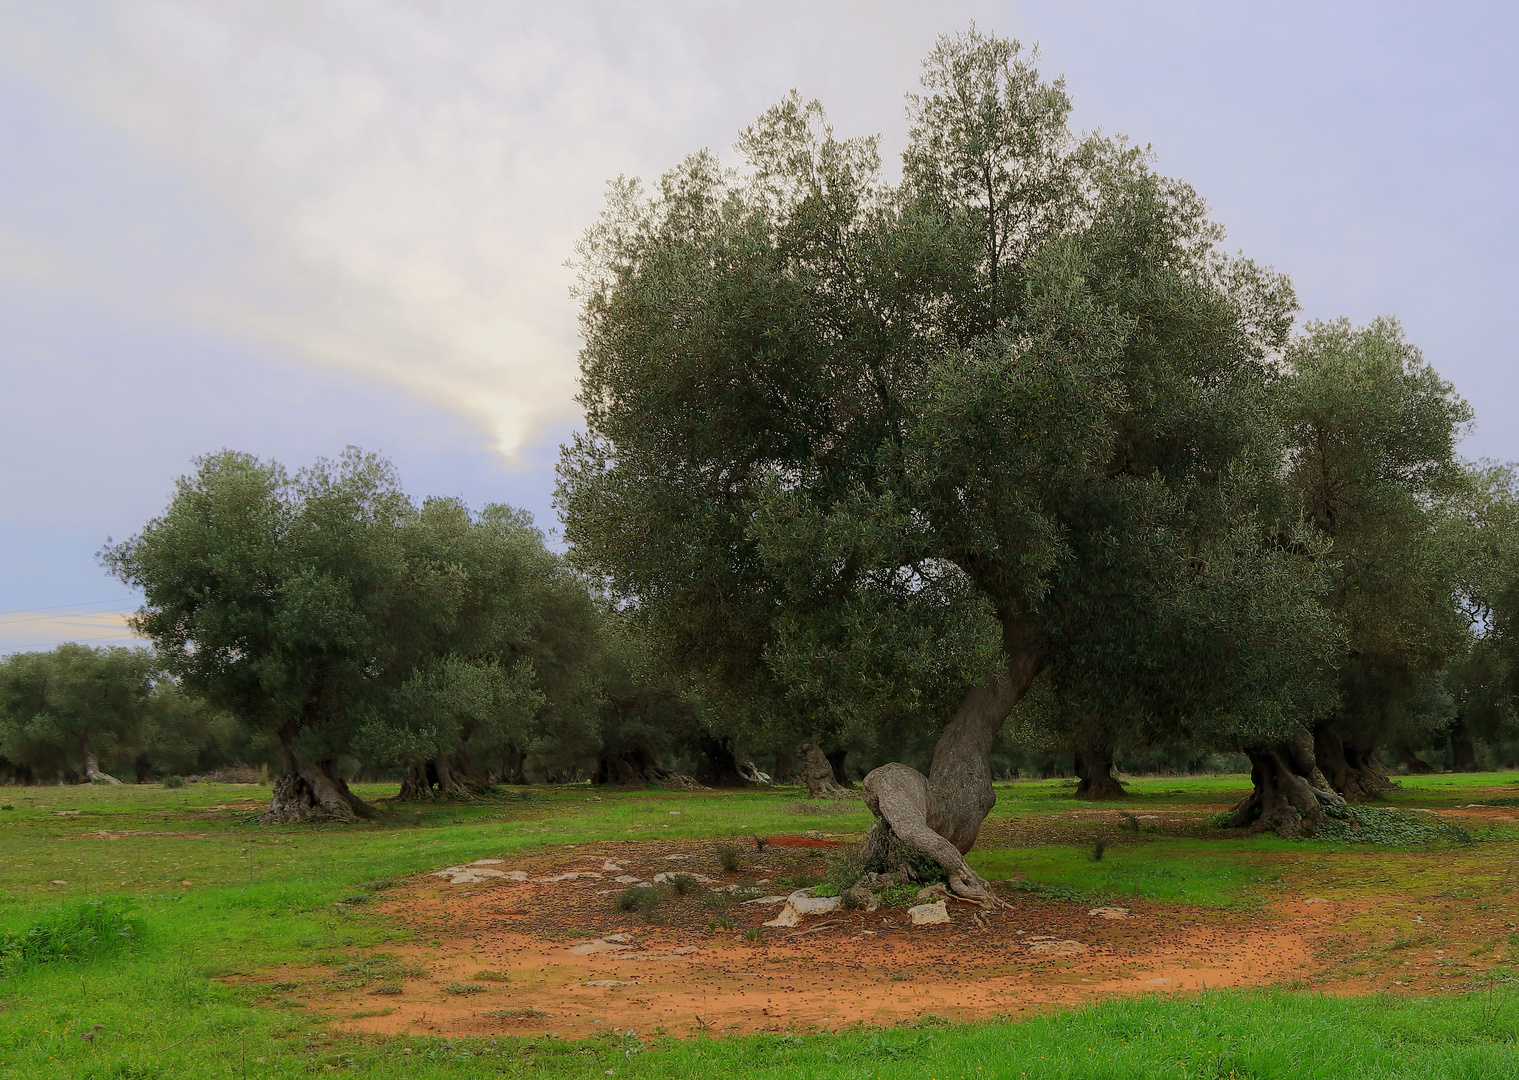 1000-jährige Olivenbäume in Apulien bei Nardò